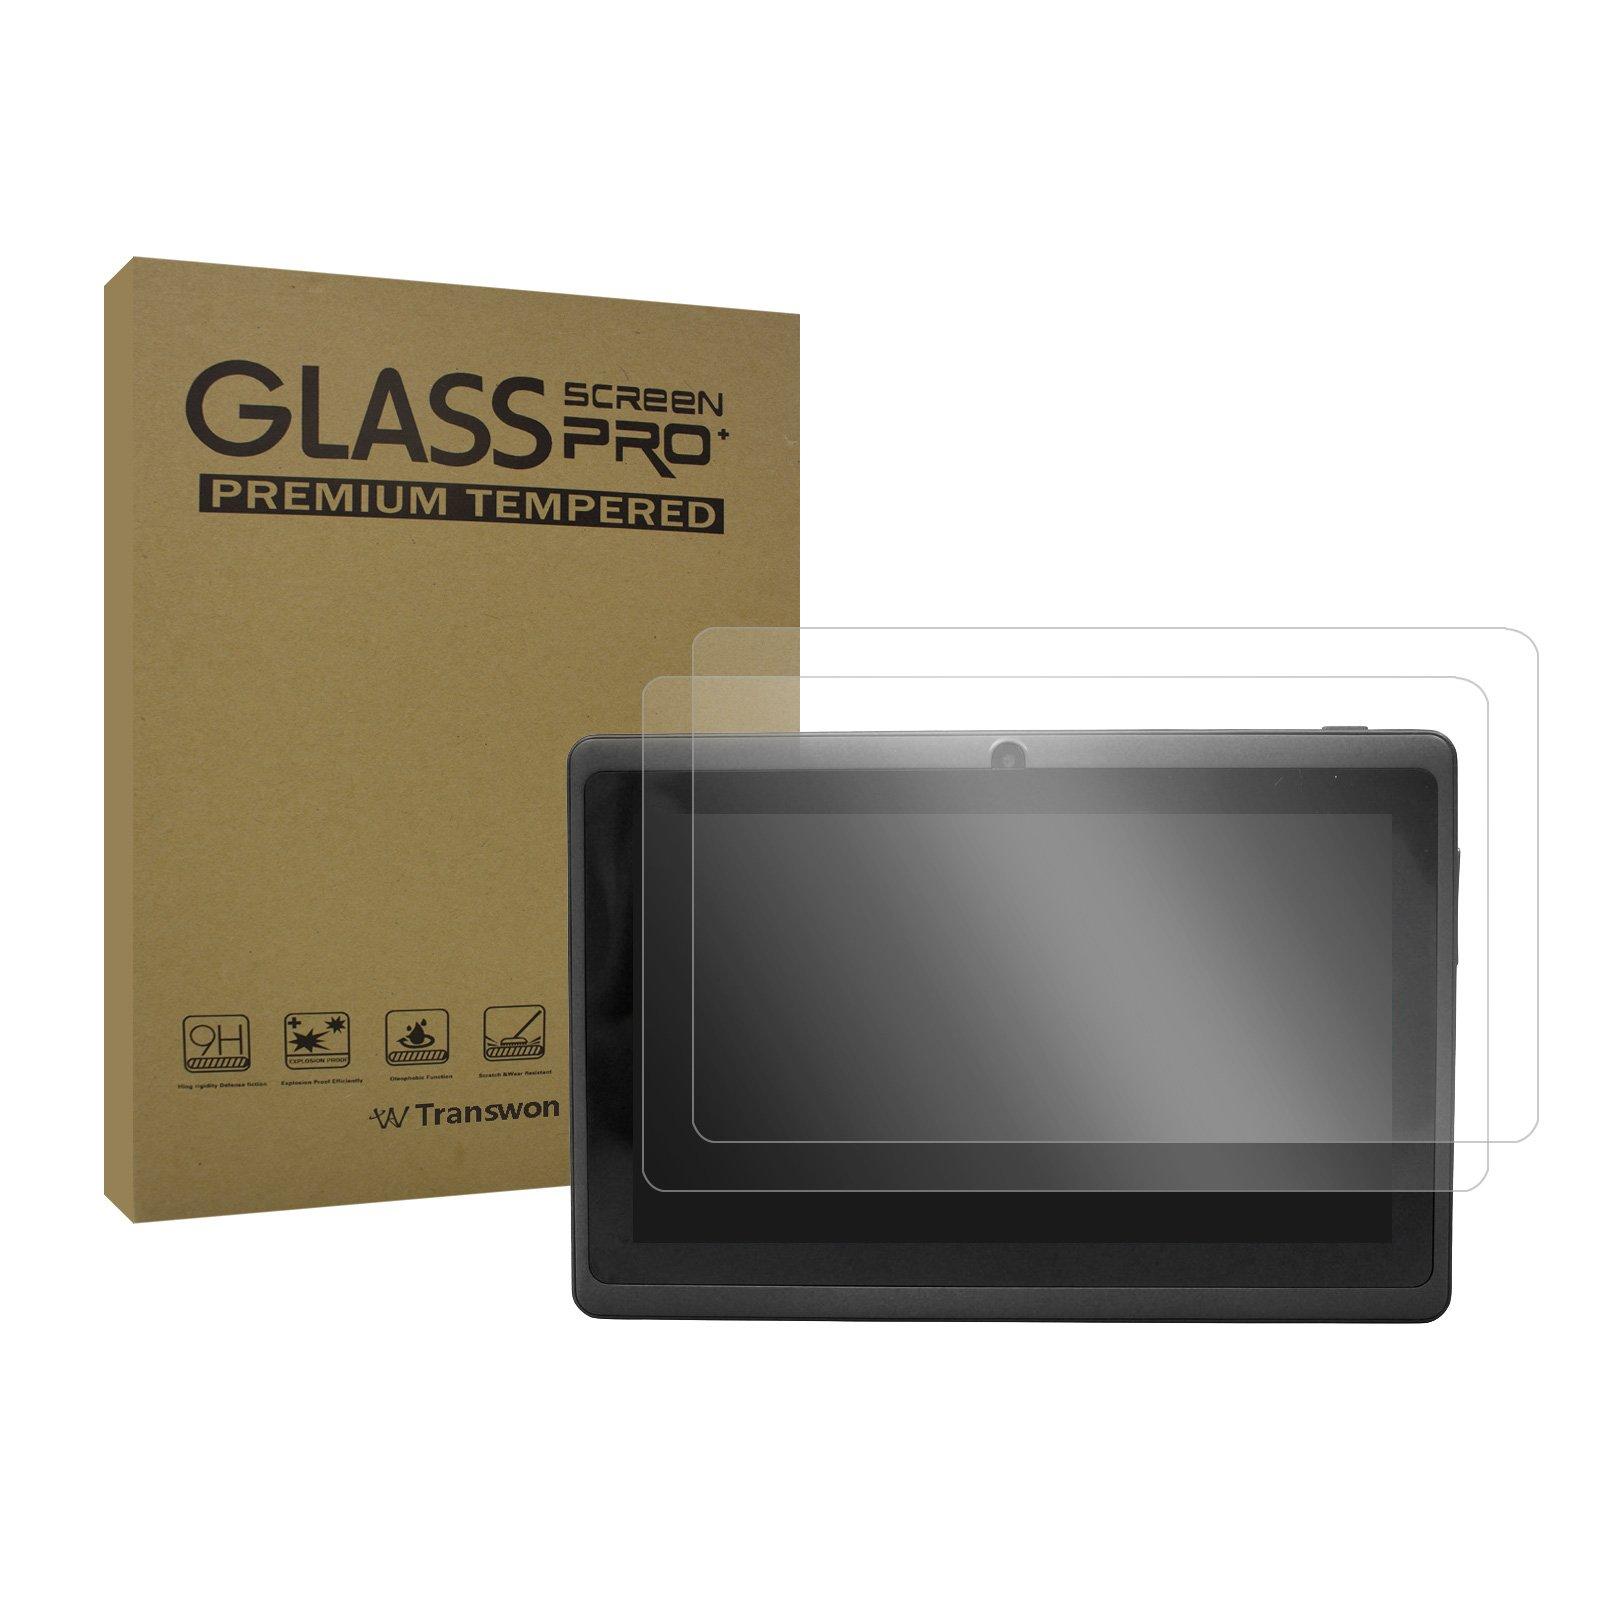 Transwon 2-Pack Tempered Glass Screen Protector for iRULU 7 Inch Tablet, TOPELOTEK 7, Tagital 7 T7K, Dragon Touch Y88X Plus, NeuTab N7 Pro, Alldaymall A88X, YunTab Q88, Ainol Q88, VURU A33